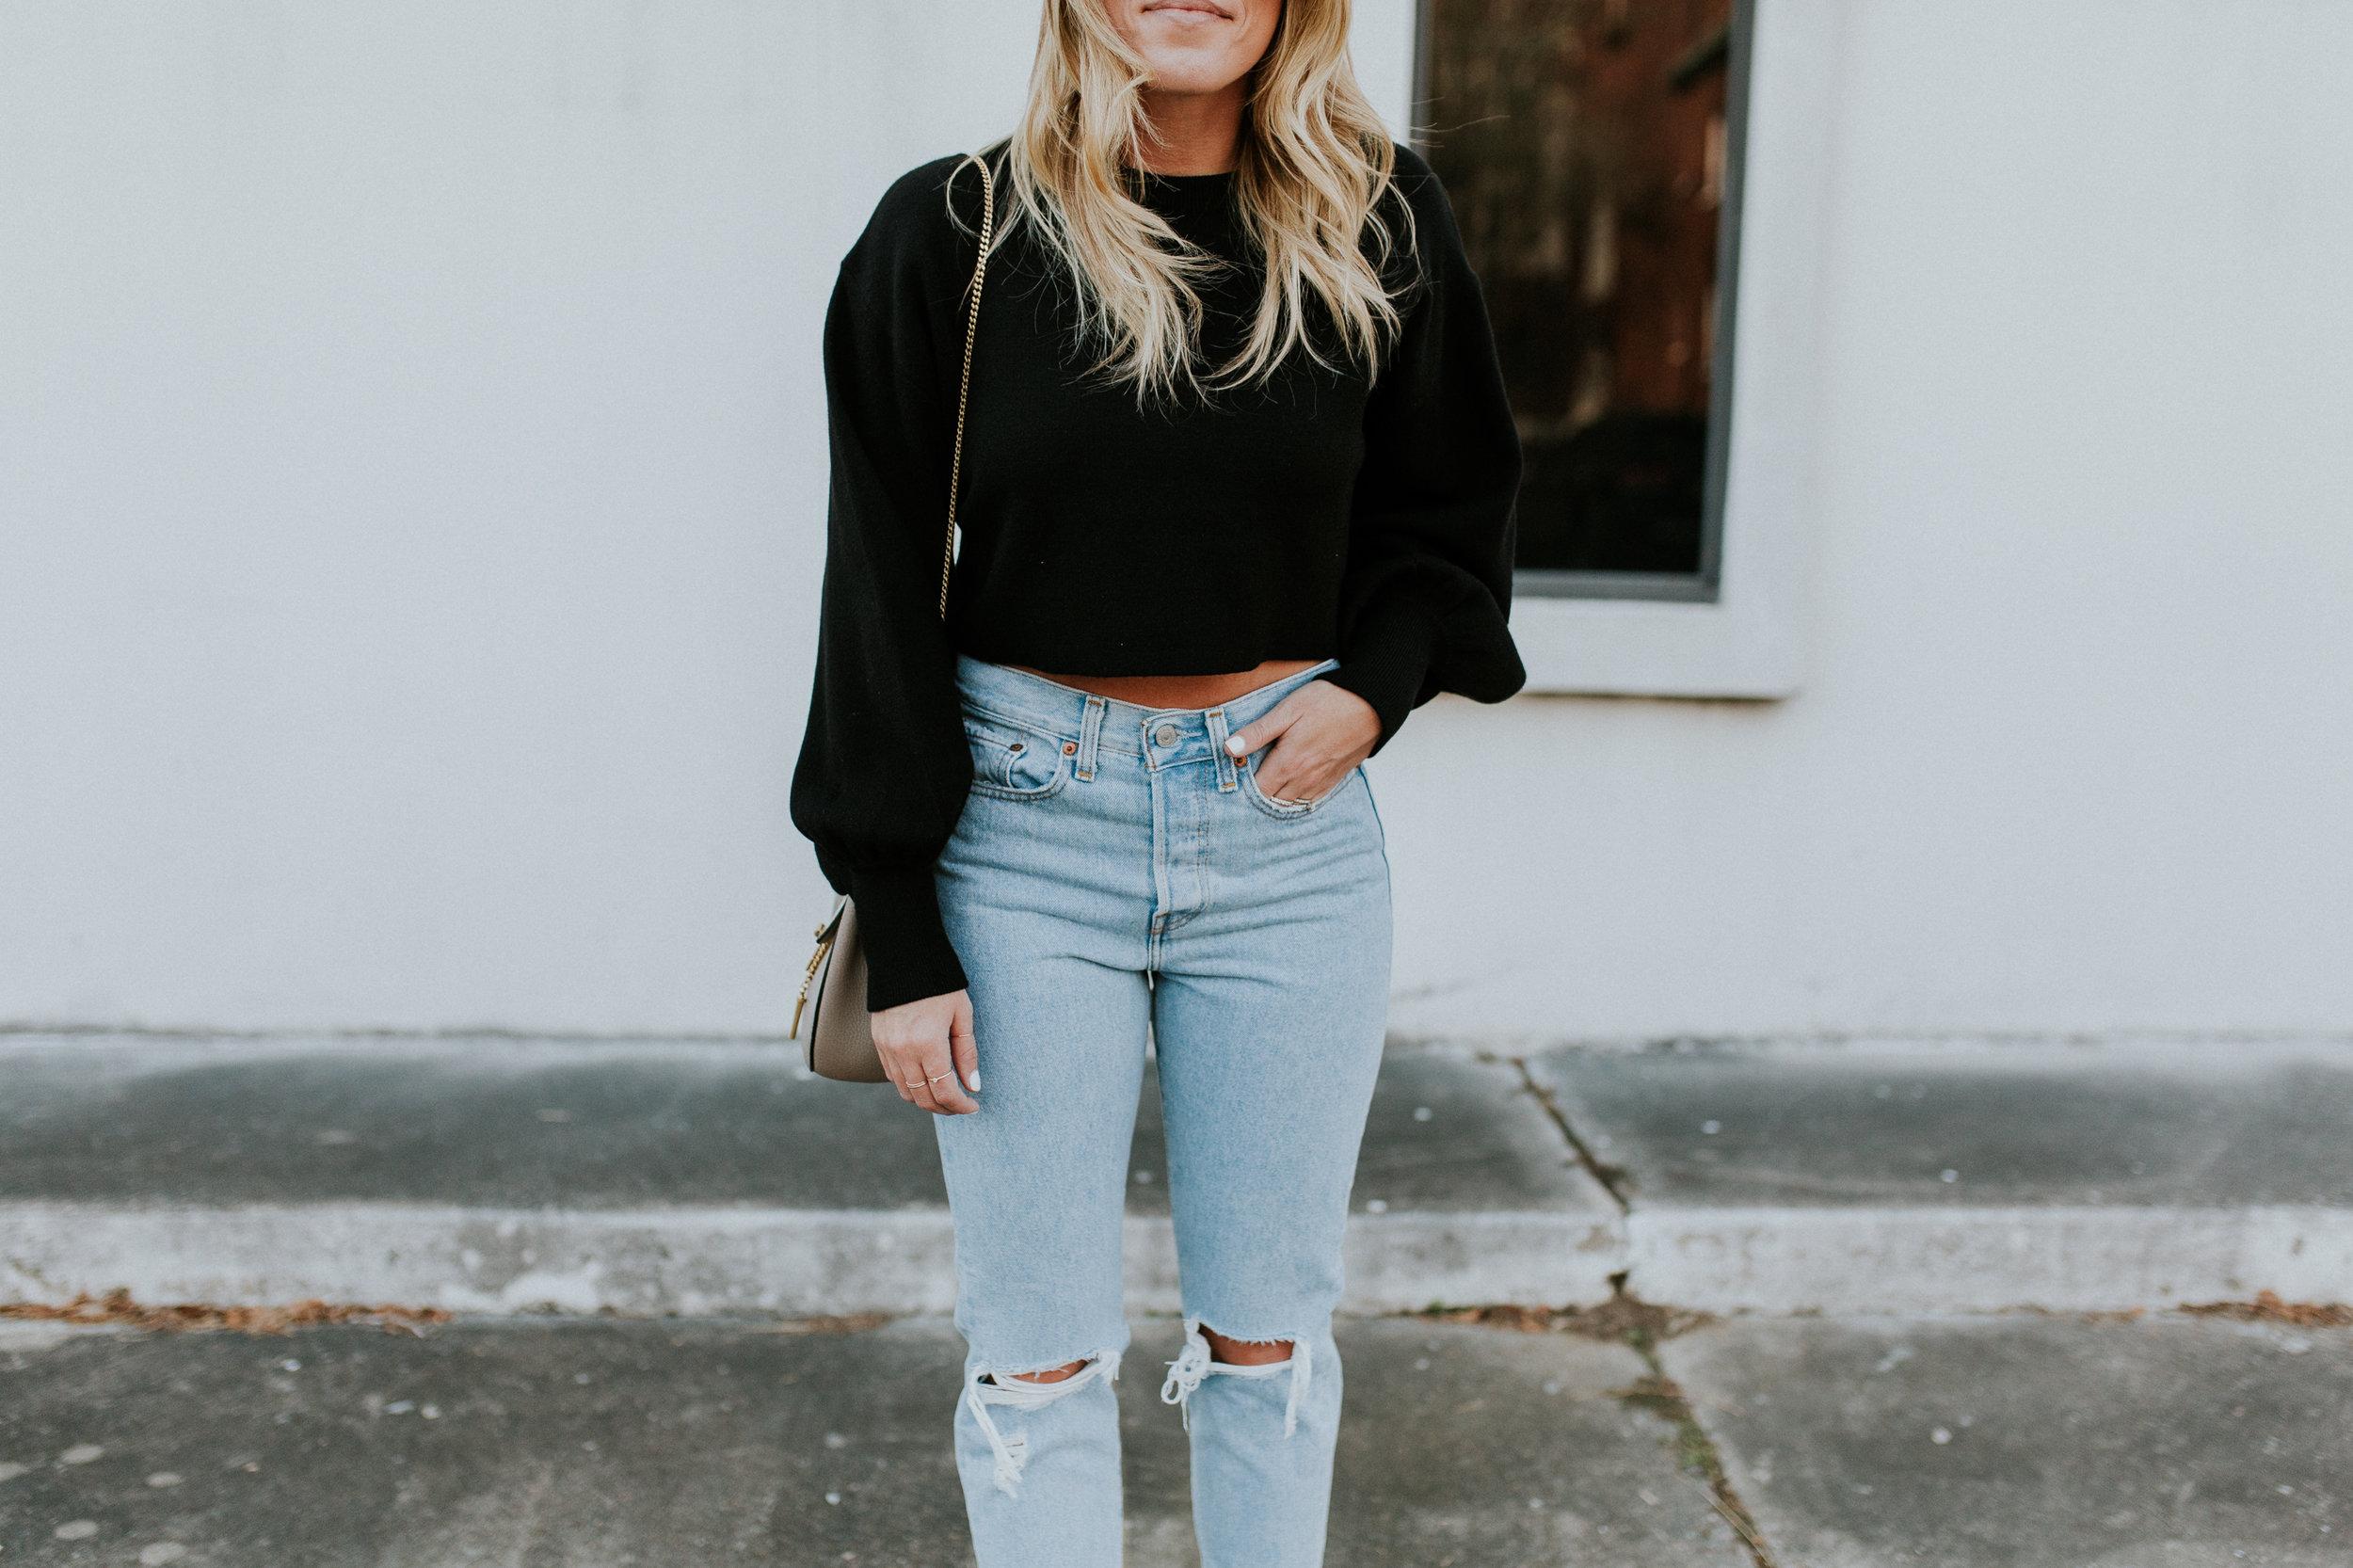 Blogger Gracefully Taylored in Levis and Dee Keller Heels(2).jpg